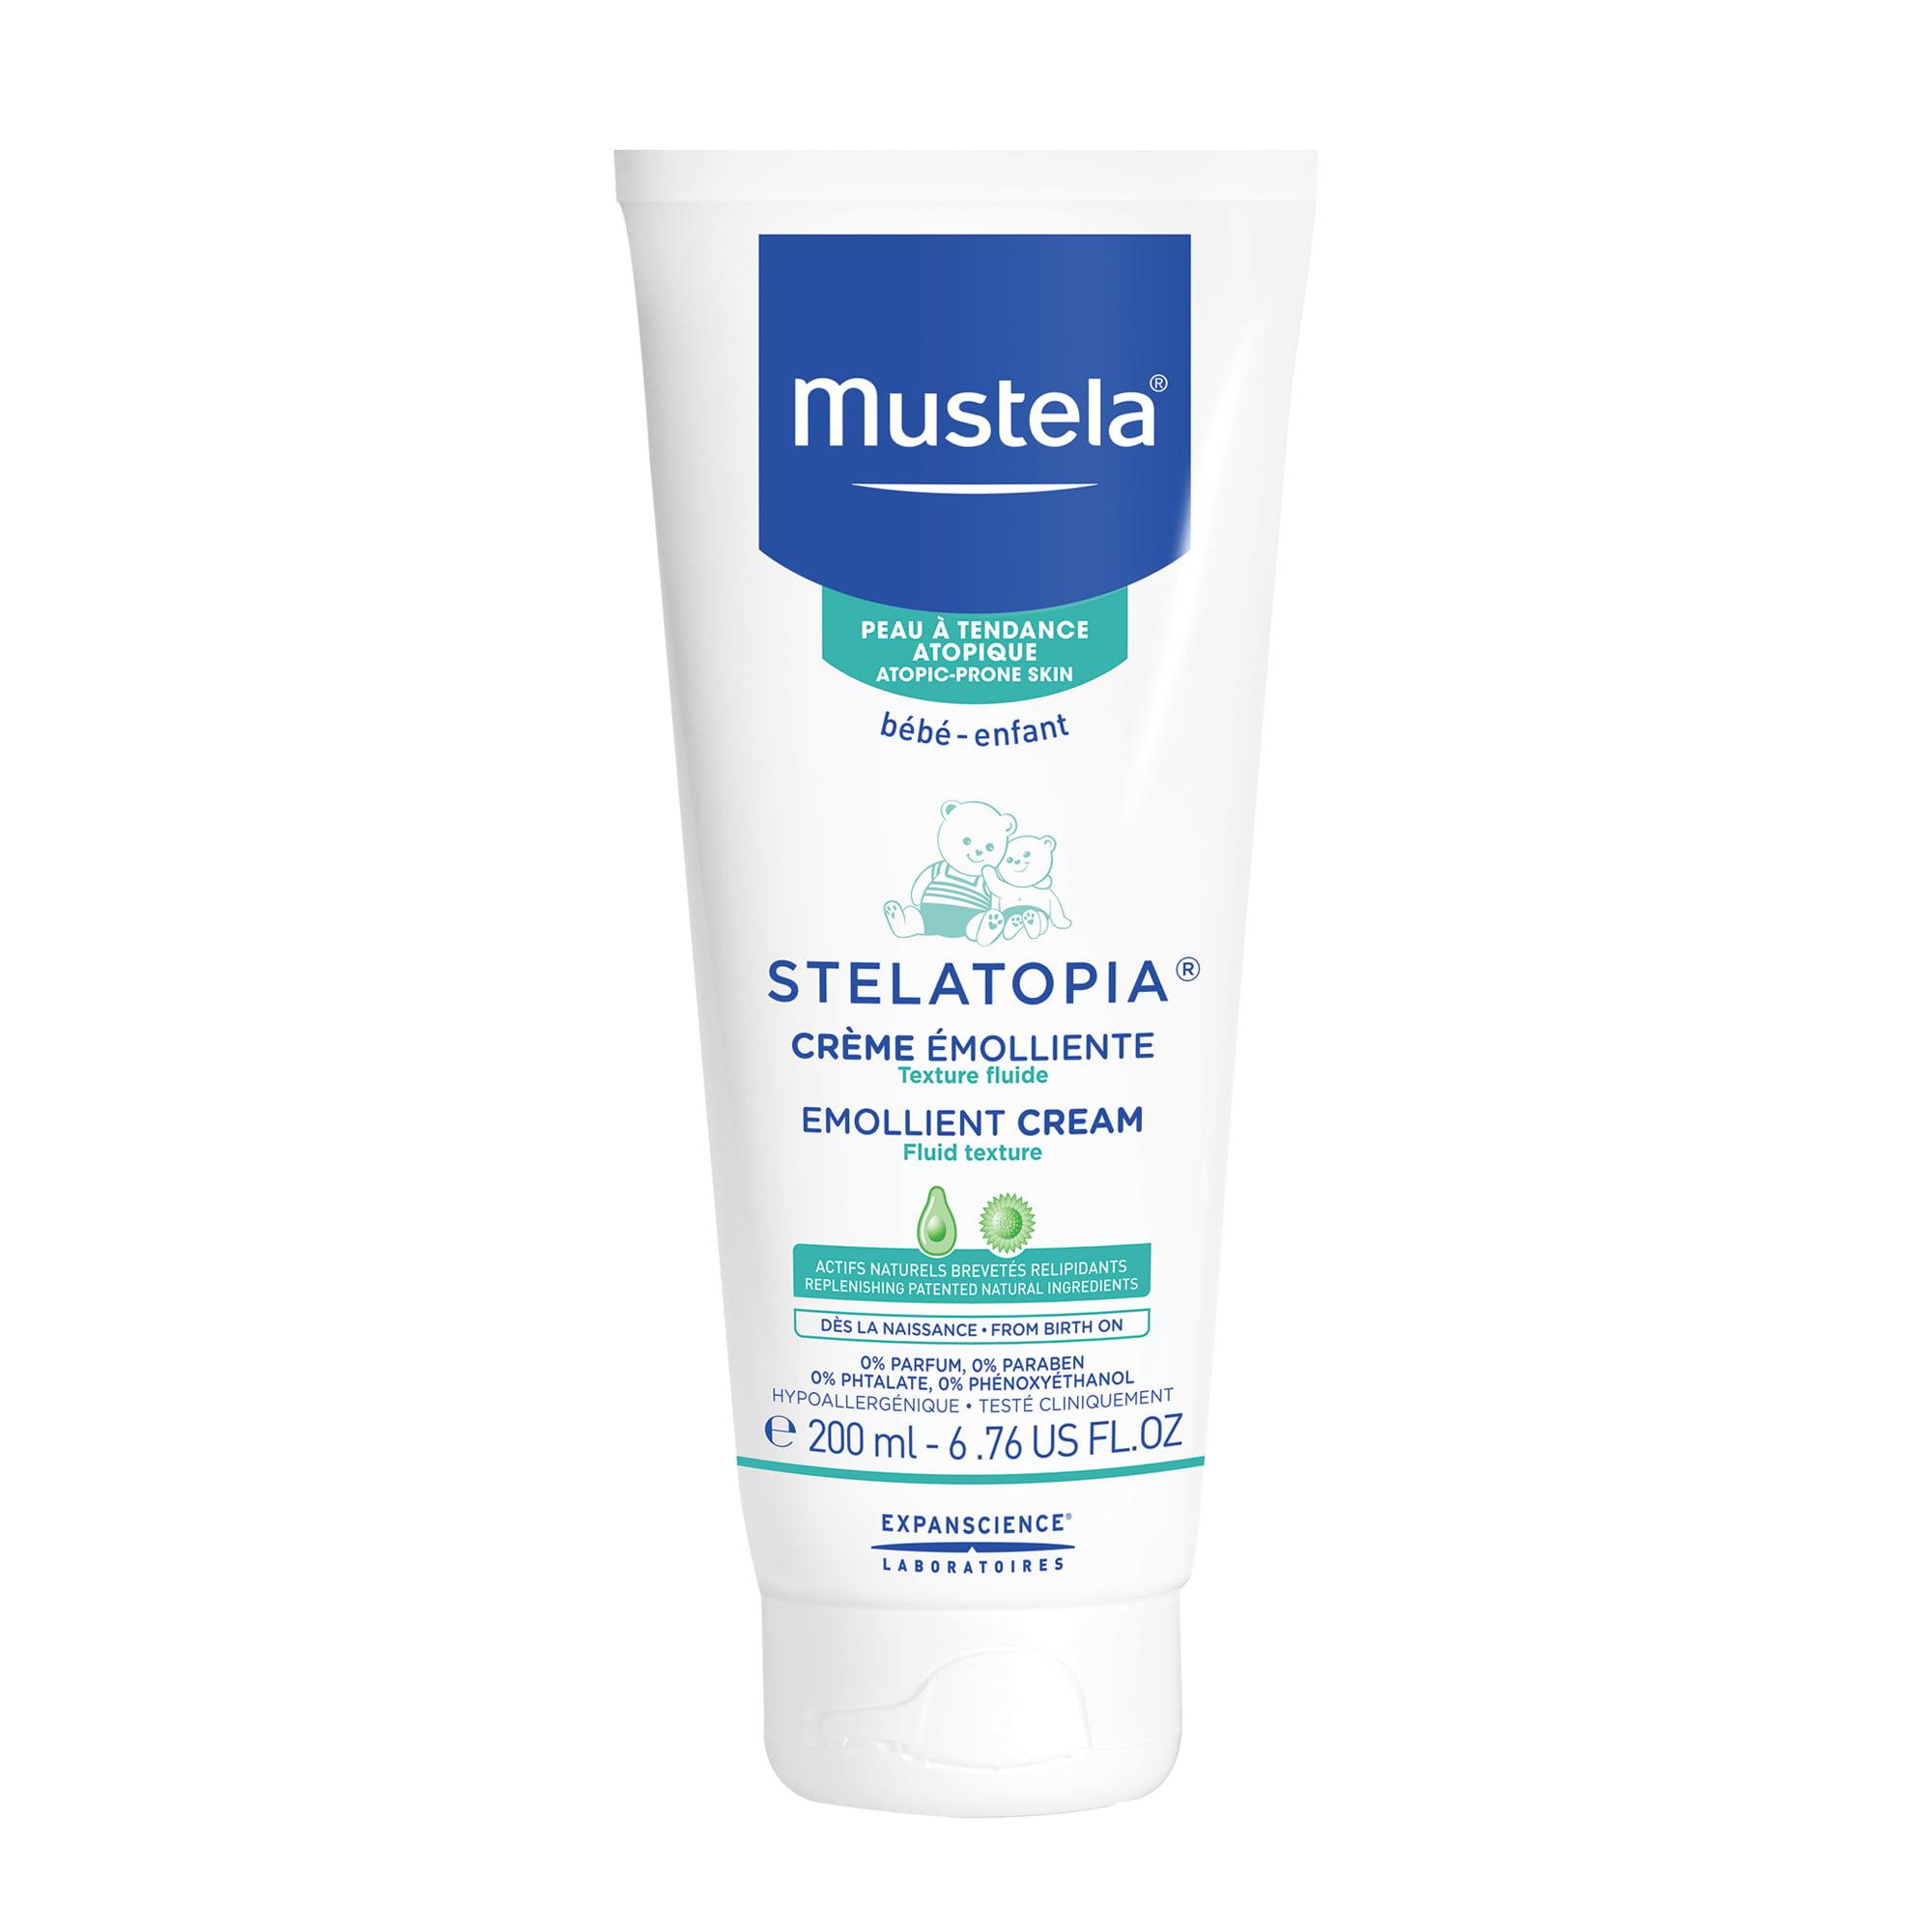 Mustela Stelatopia Baby Emollient Cream, Fragrance-Free Baby Lotion for Eczema-Prone Skin, 6.7 Oz by Mustela